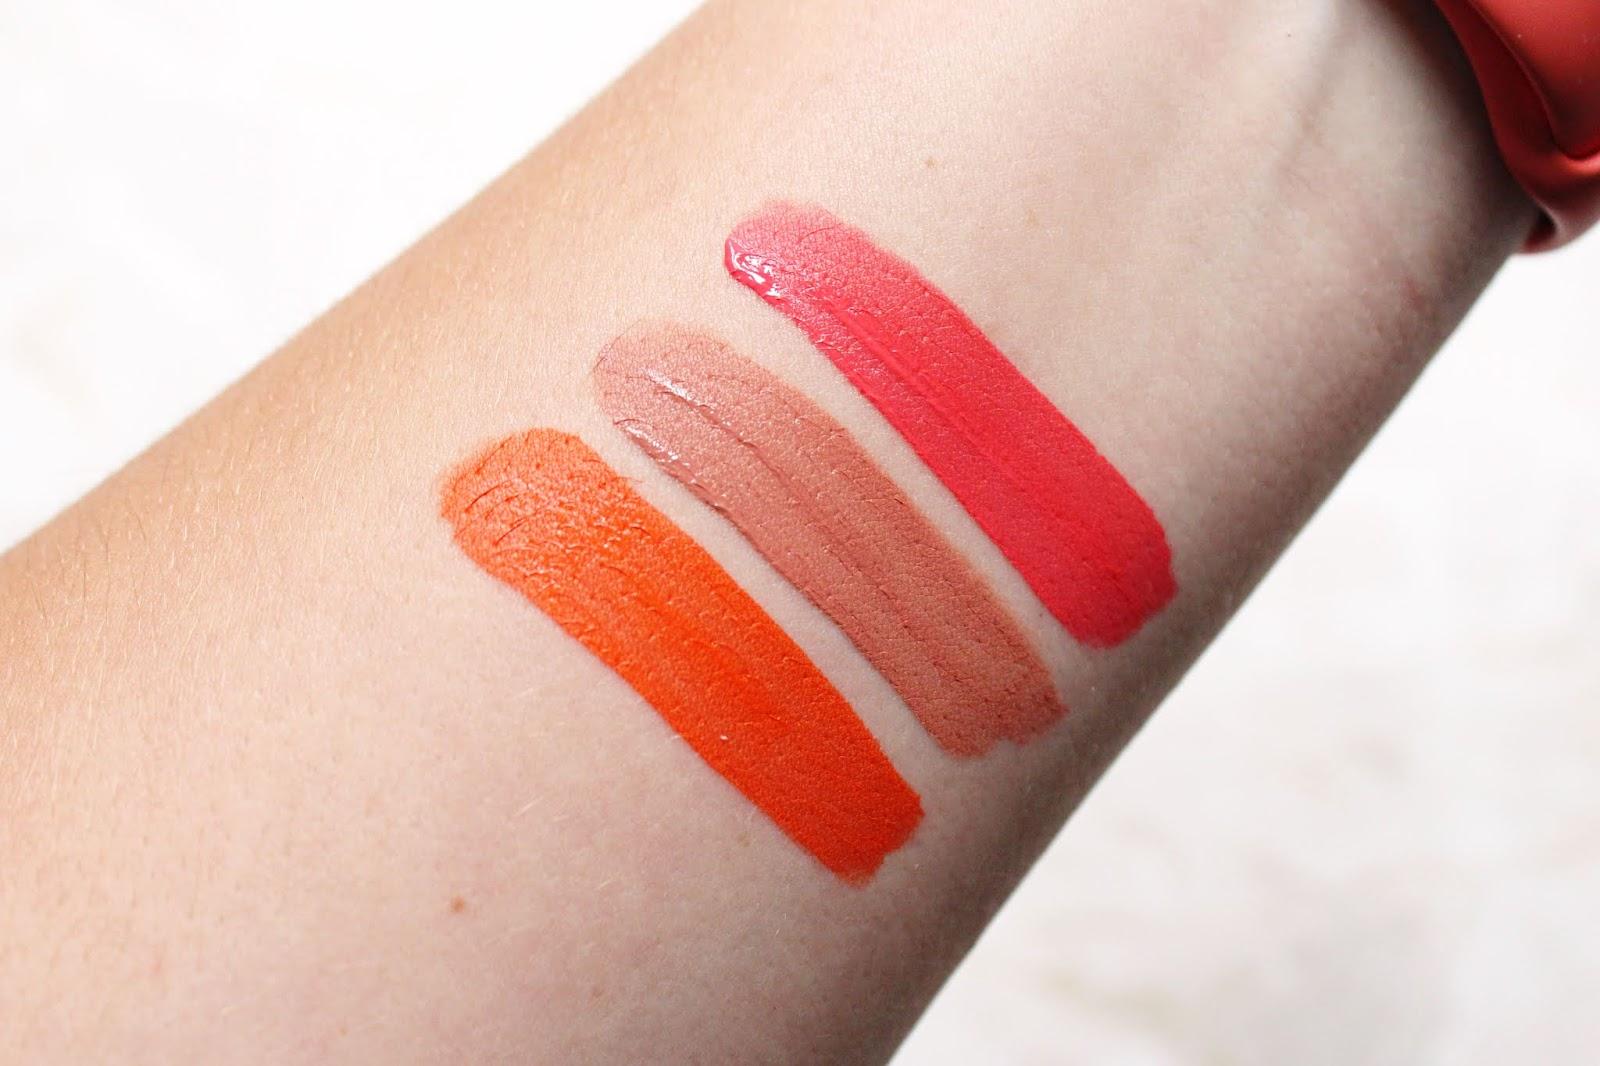 Beauty BLVD Mattitude Liquid Lipsticks